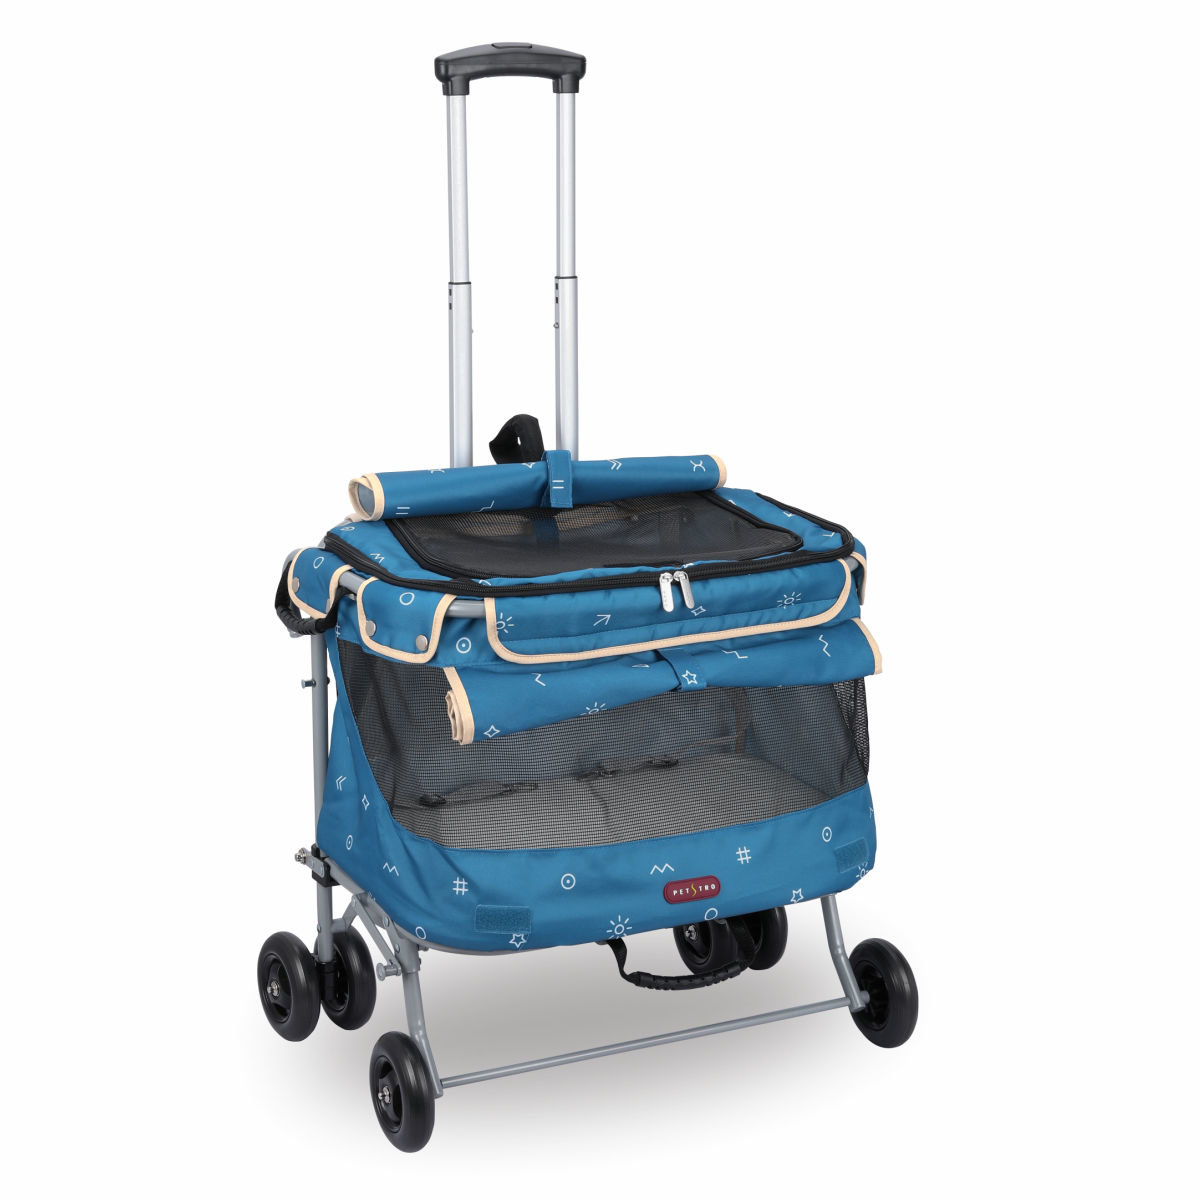 215A Petstro-寵物推車 輕旅行(加大型)-2代 (藍色幾何)